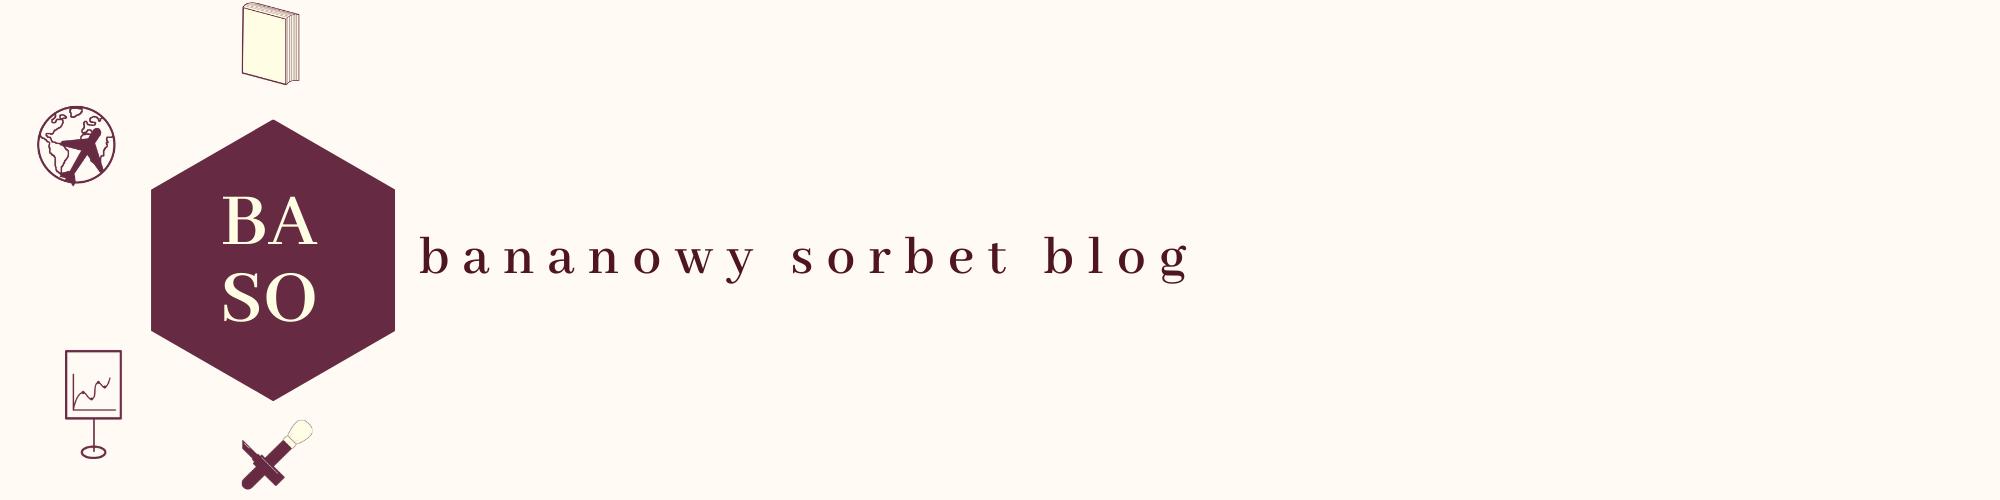 Bananowy Sorbet Blog